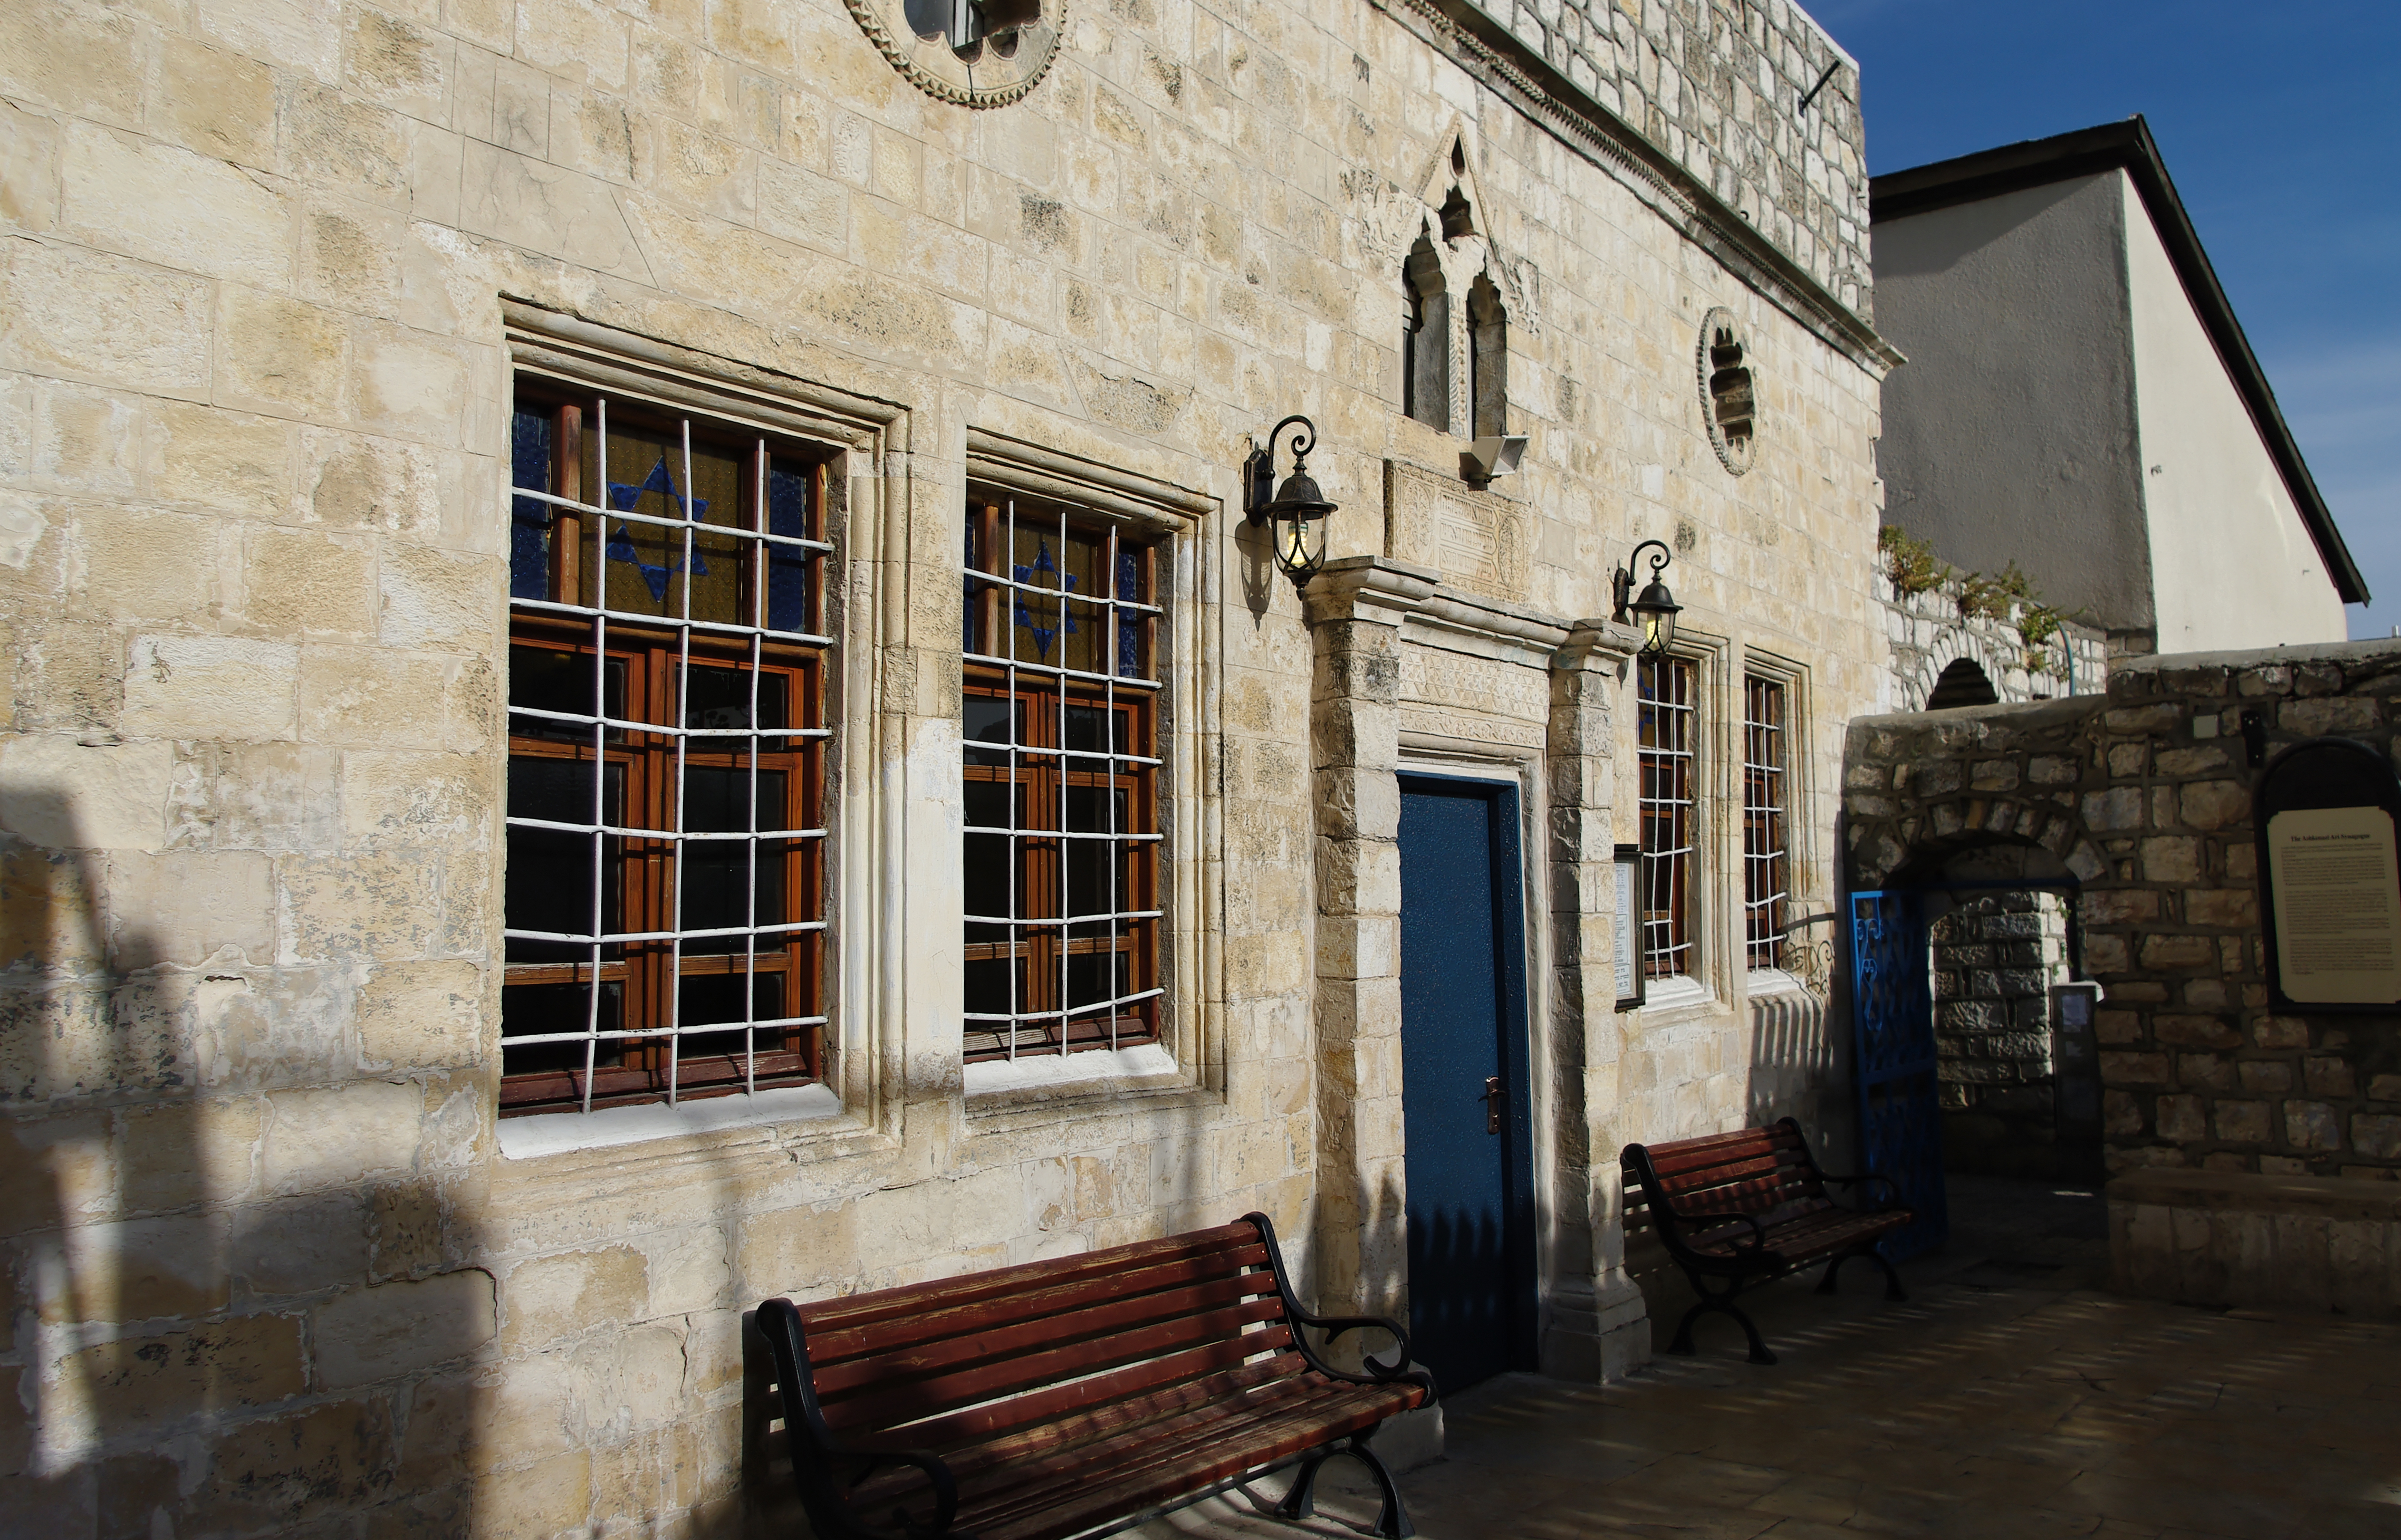 File:Ari Ashkenazi Synagogue, Tsfat (Safed) - Israël ...